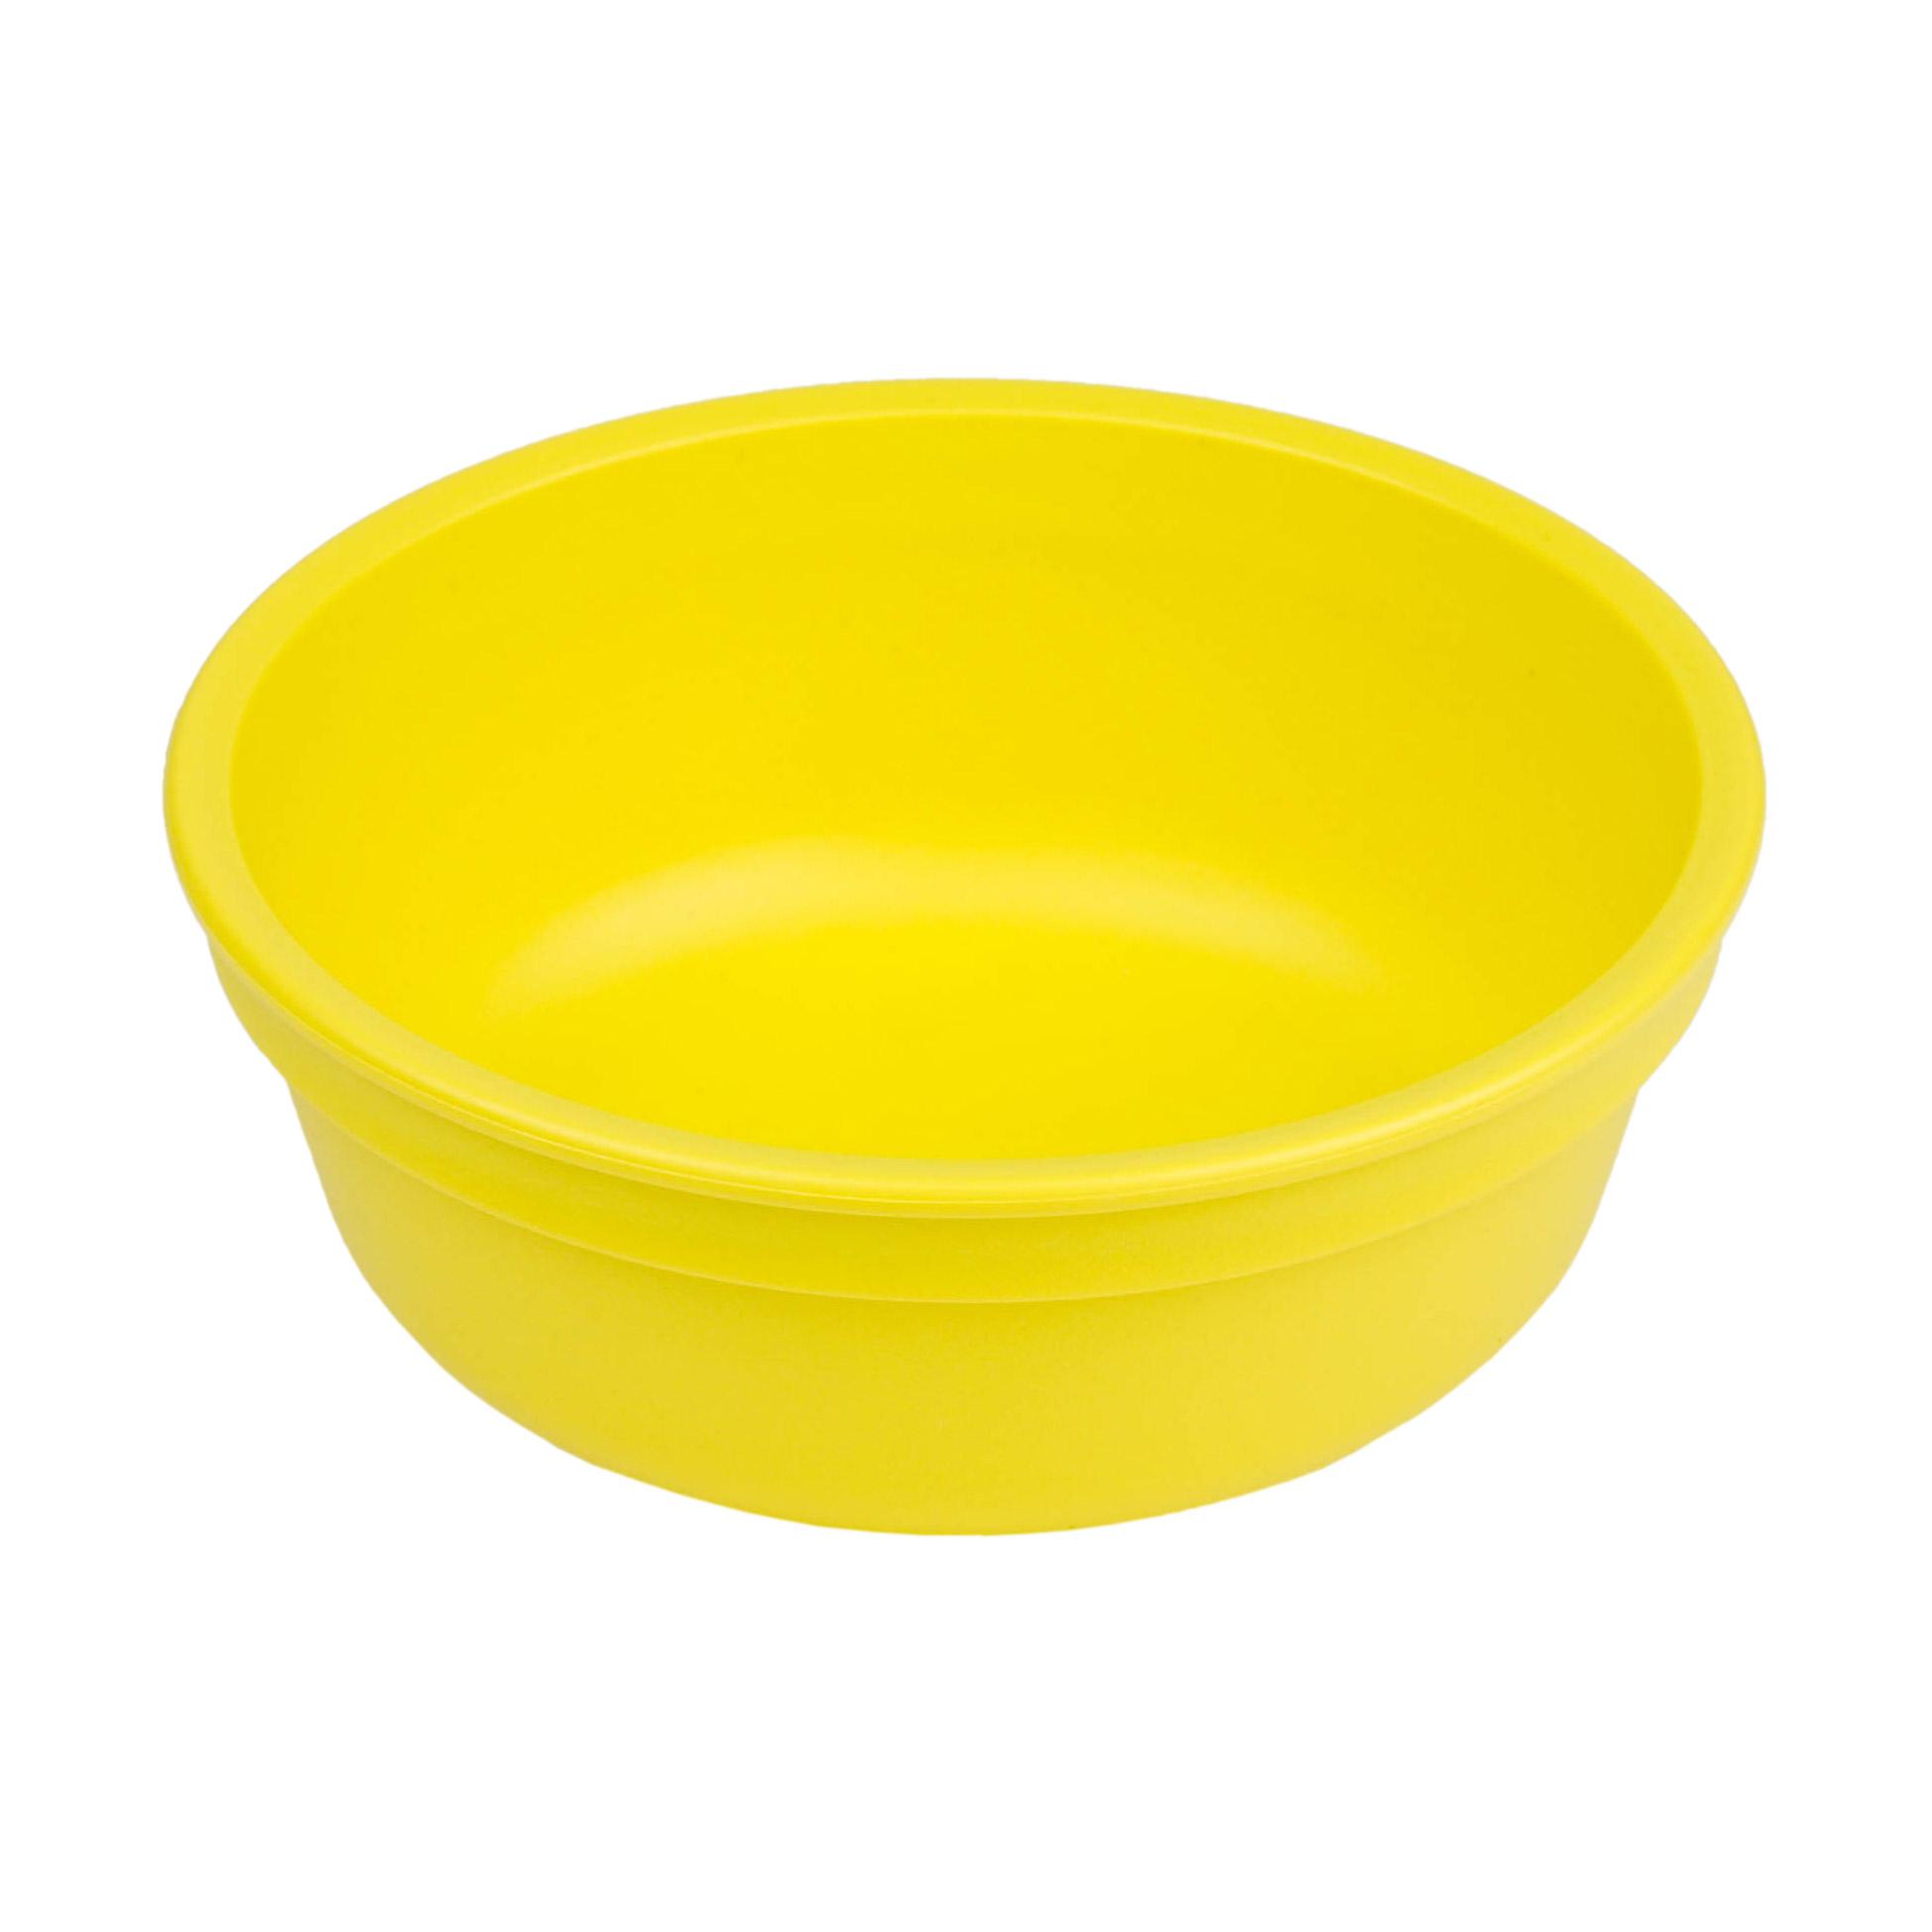 bowl play